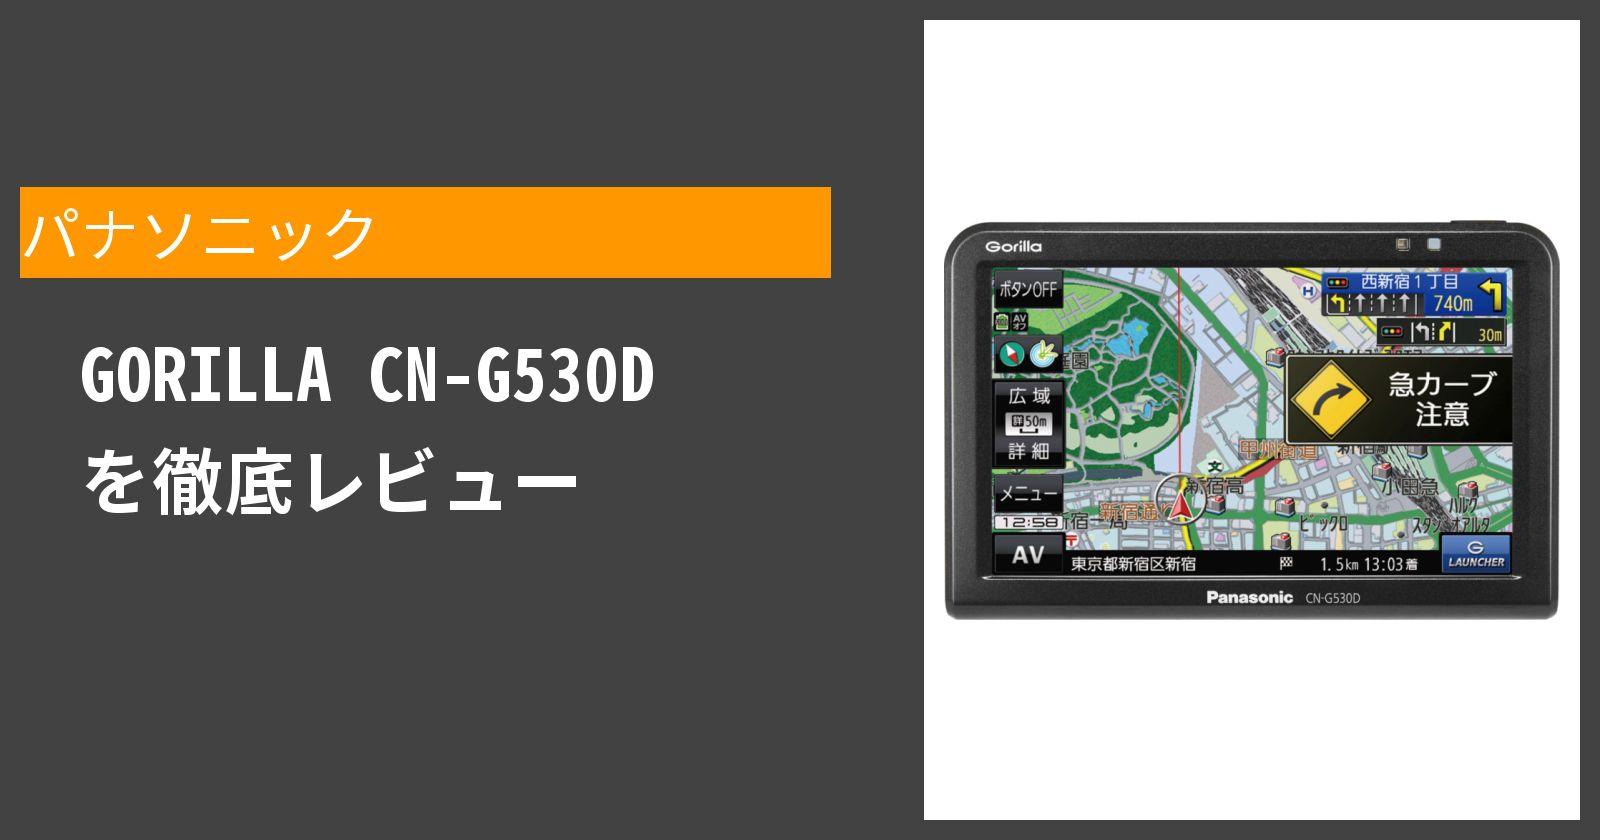 GORILLA CN-G530Dを徹底評価